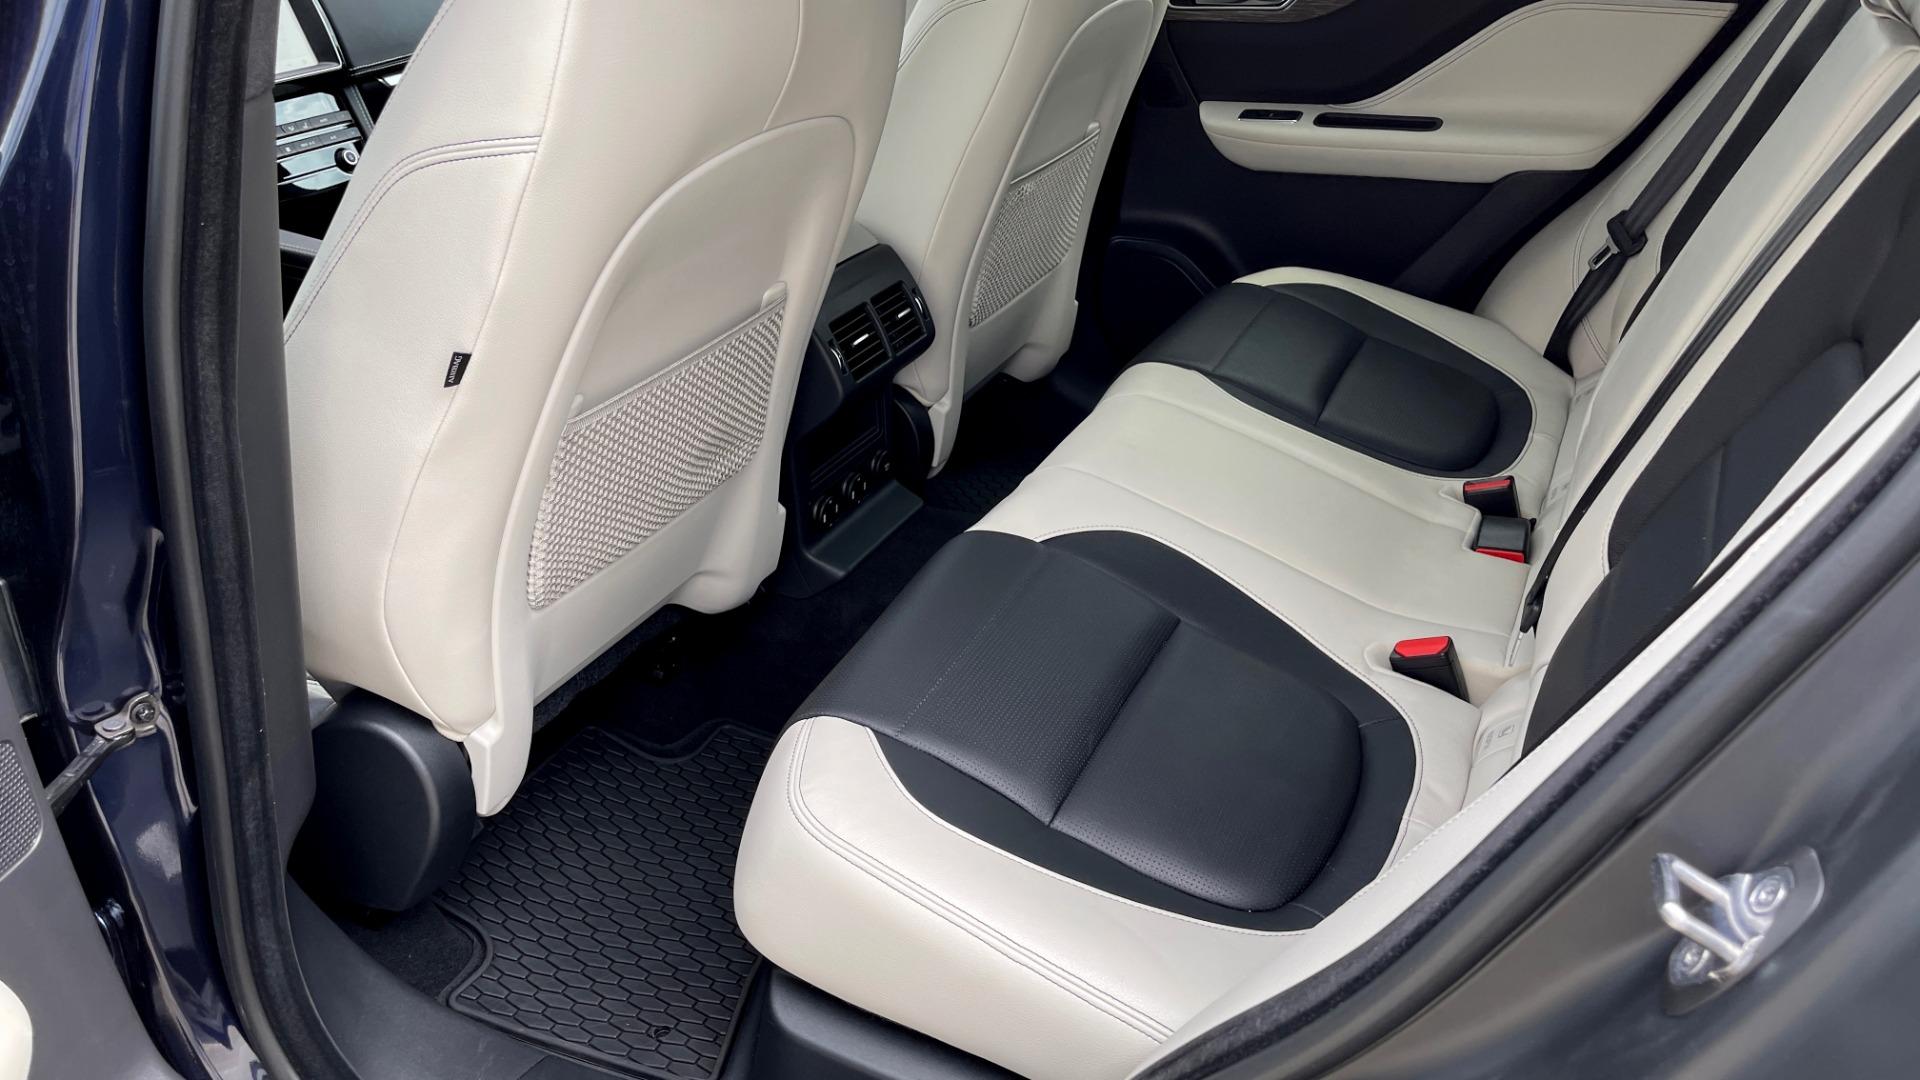 Used 2019 Jaguar F-PACE S / DRIVE PKG / BSA / HUD / BLACK EXT PKG / REARVIEW for sale $50,995 at Formula Imports in Charlotte NC 28227 50